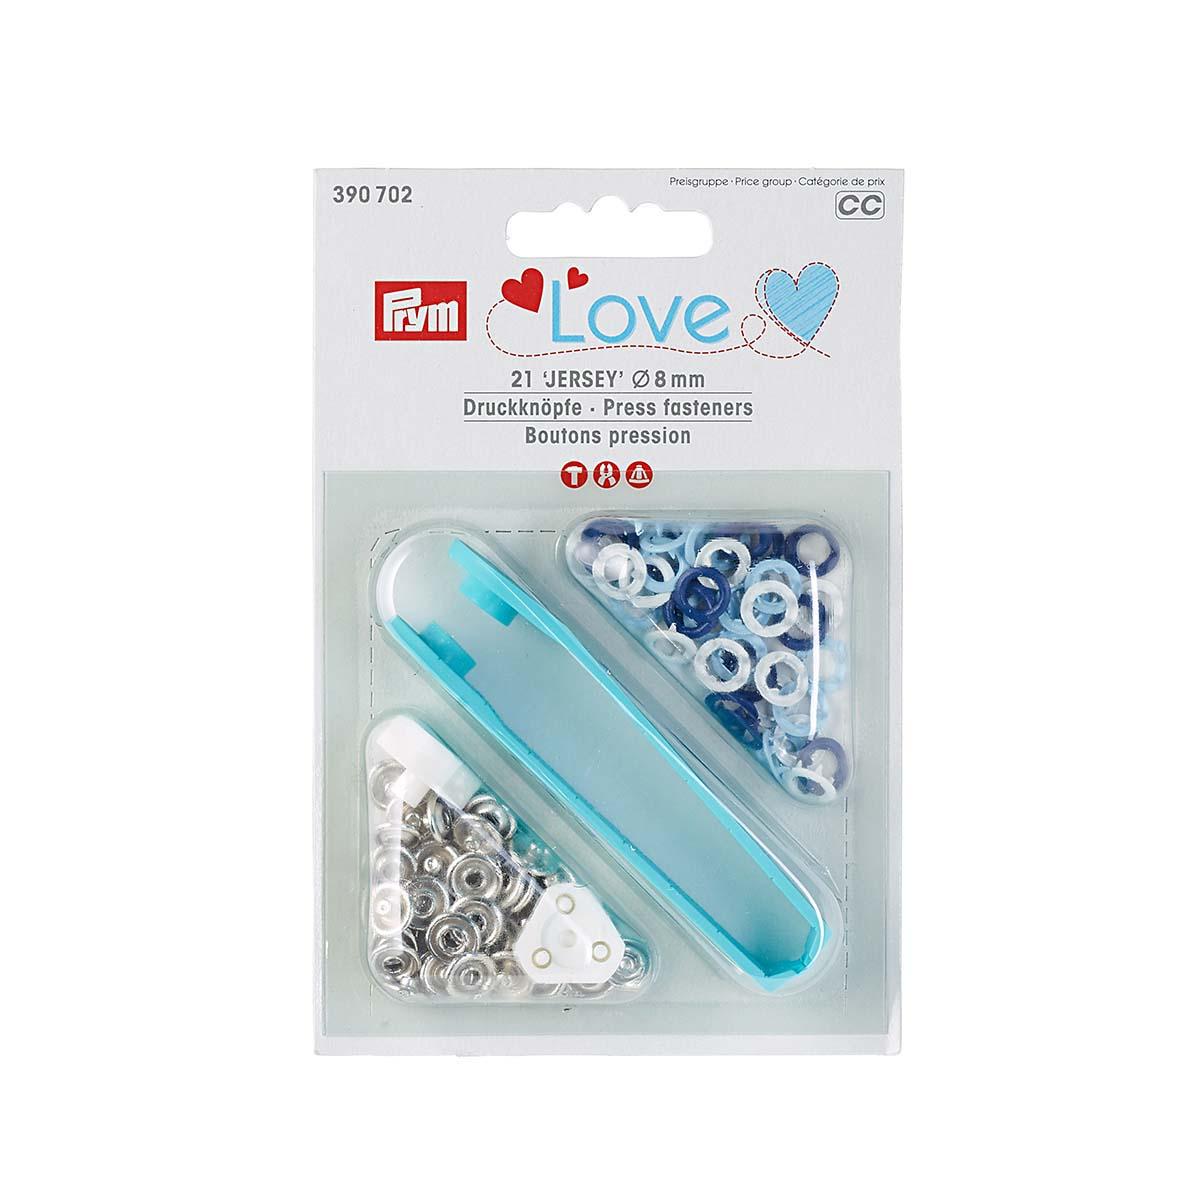 390702 Кнопки Джерси, син/бел/голубой цв, 8мм, 21шт/упак, Prym